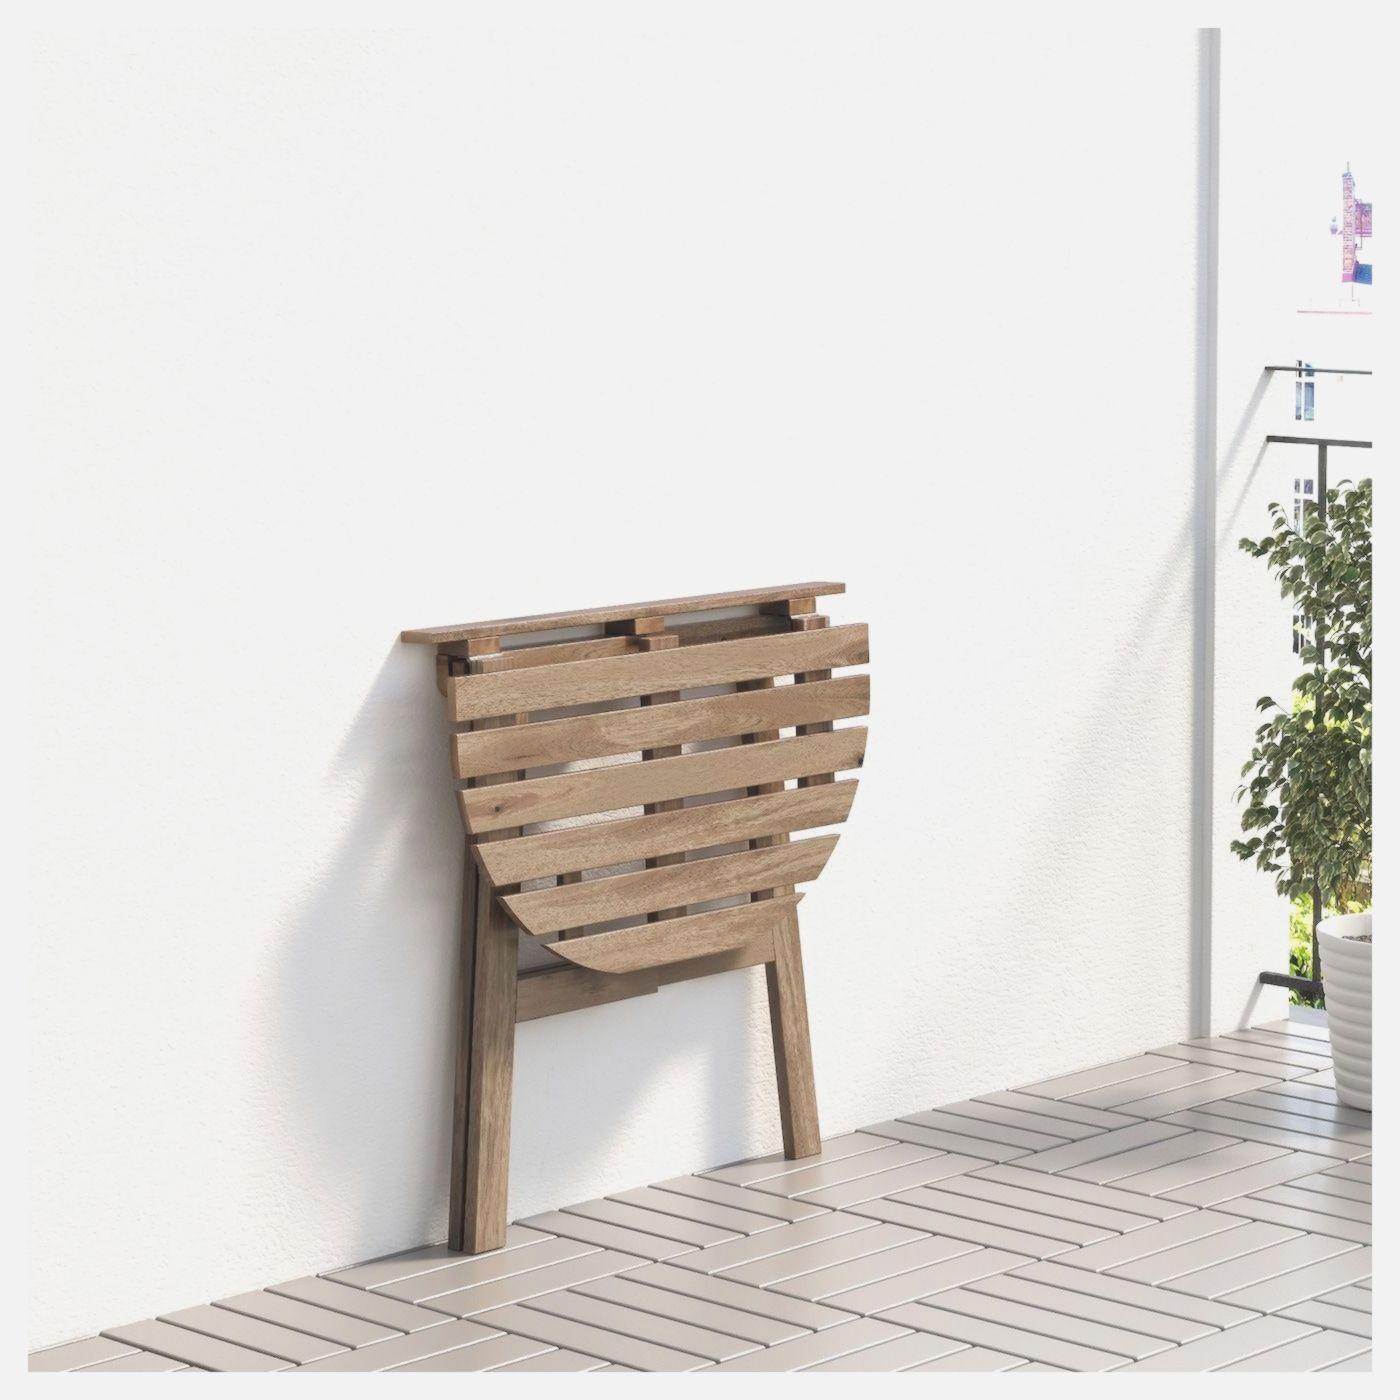 Askholmen Aussen Gebeizt Graubraun Ikea Klappbar Wandtisch